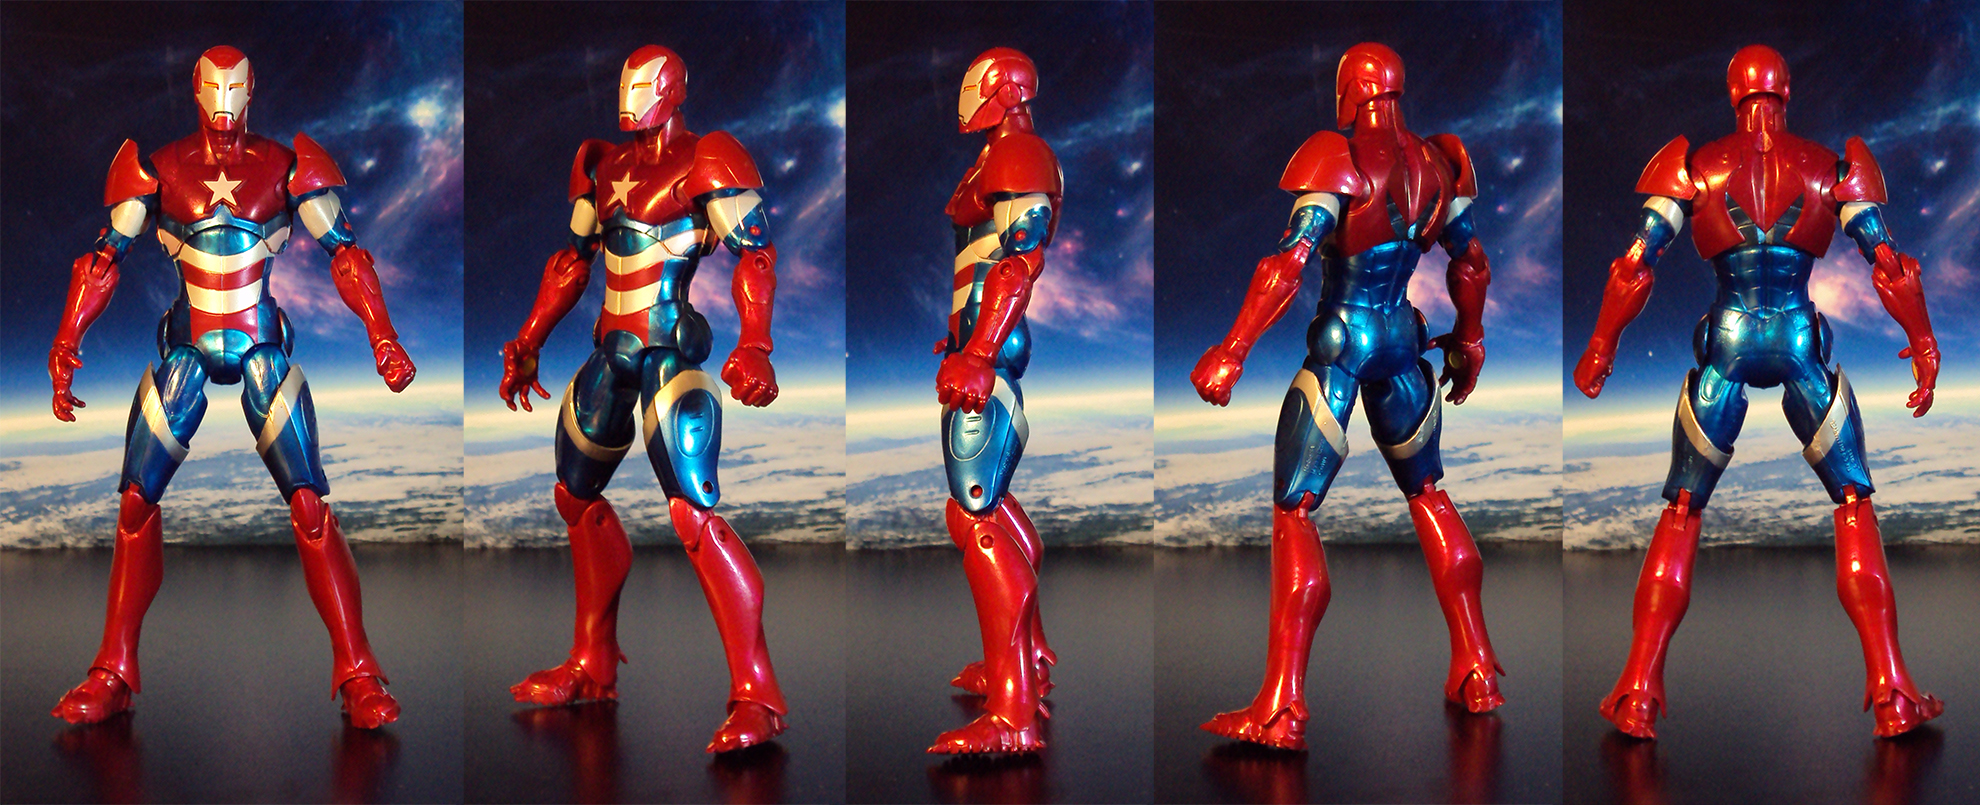 Today S Arrival Hasbro Iron Man 3 Movie Series 1 6